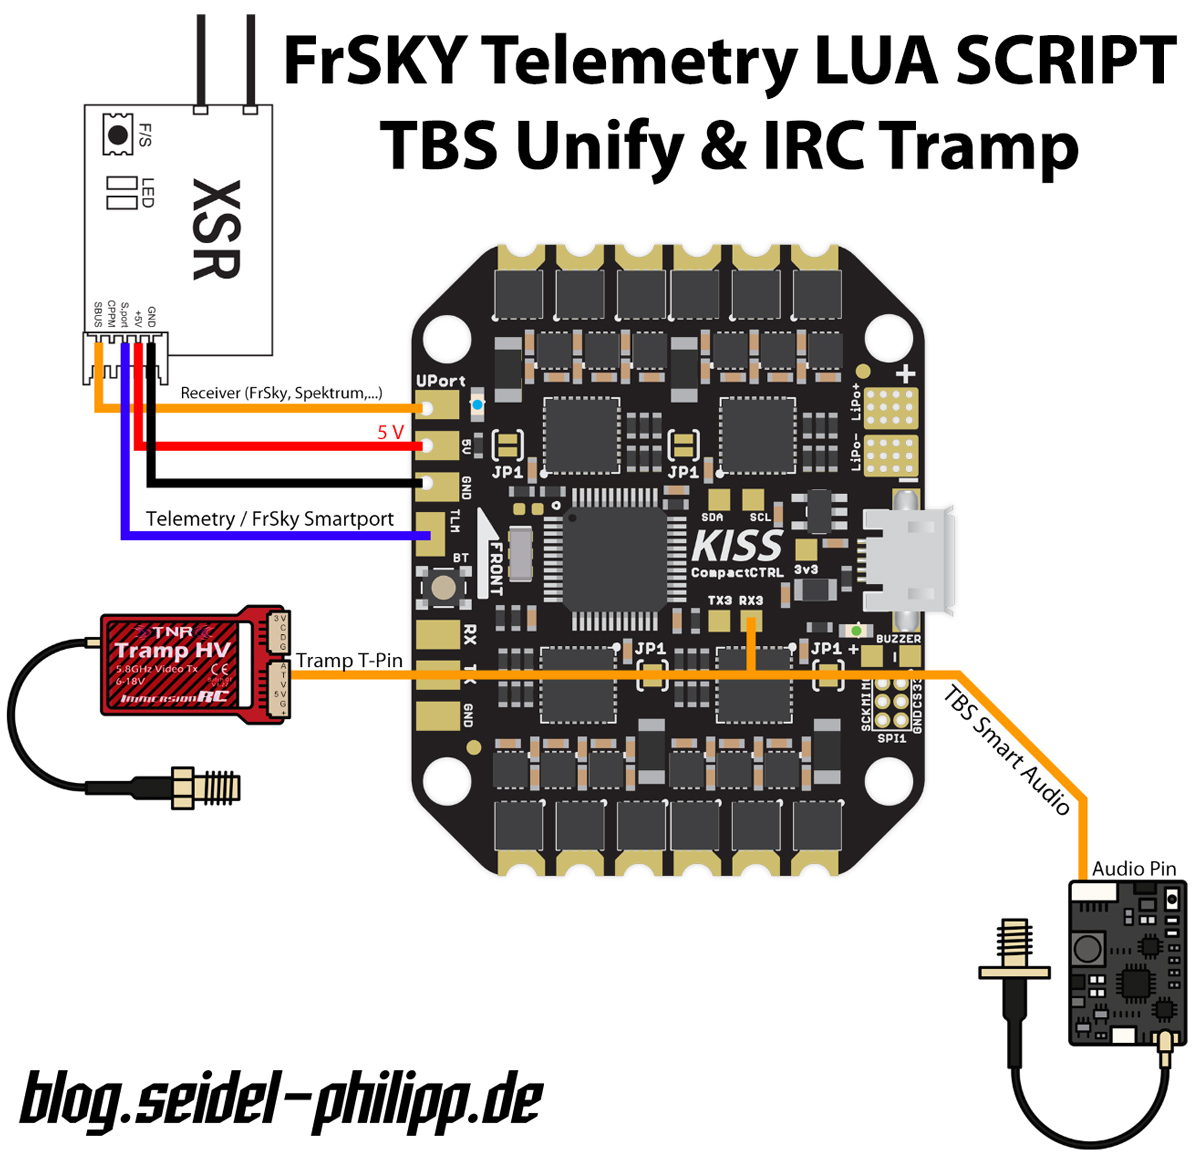 Tramp Vtx Wiring Diagram Manual Of Honda Flyduino Kiss Fc Cc Lua Script For Pids Settings And Rh Blog Seidel Philipp De